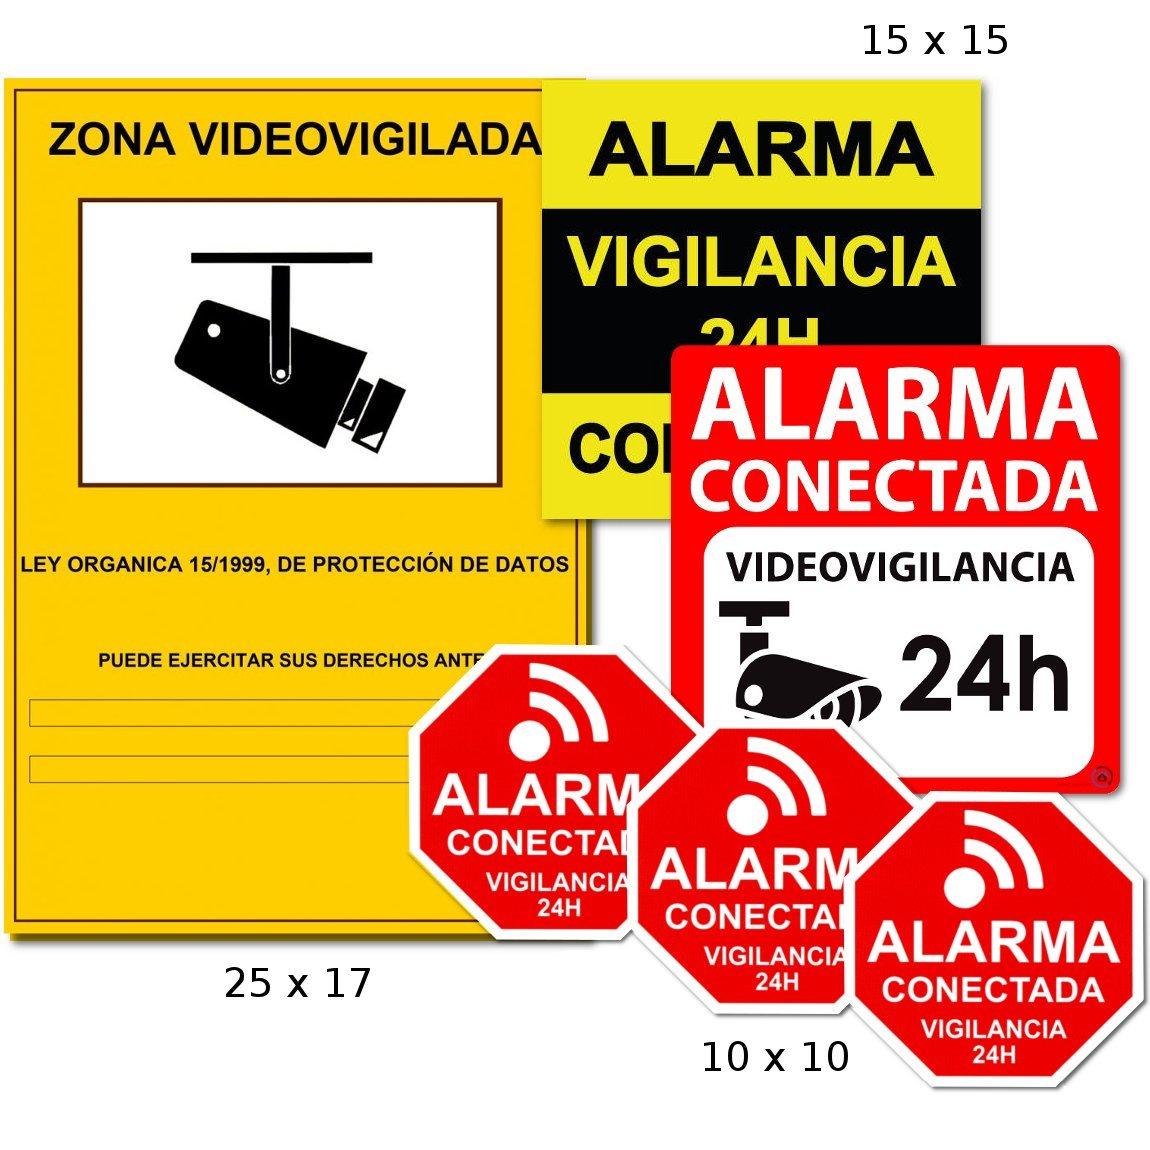 AAPC -Pack 6 vinilos disuasorios Zona Videovigilada CCTV ...